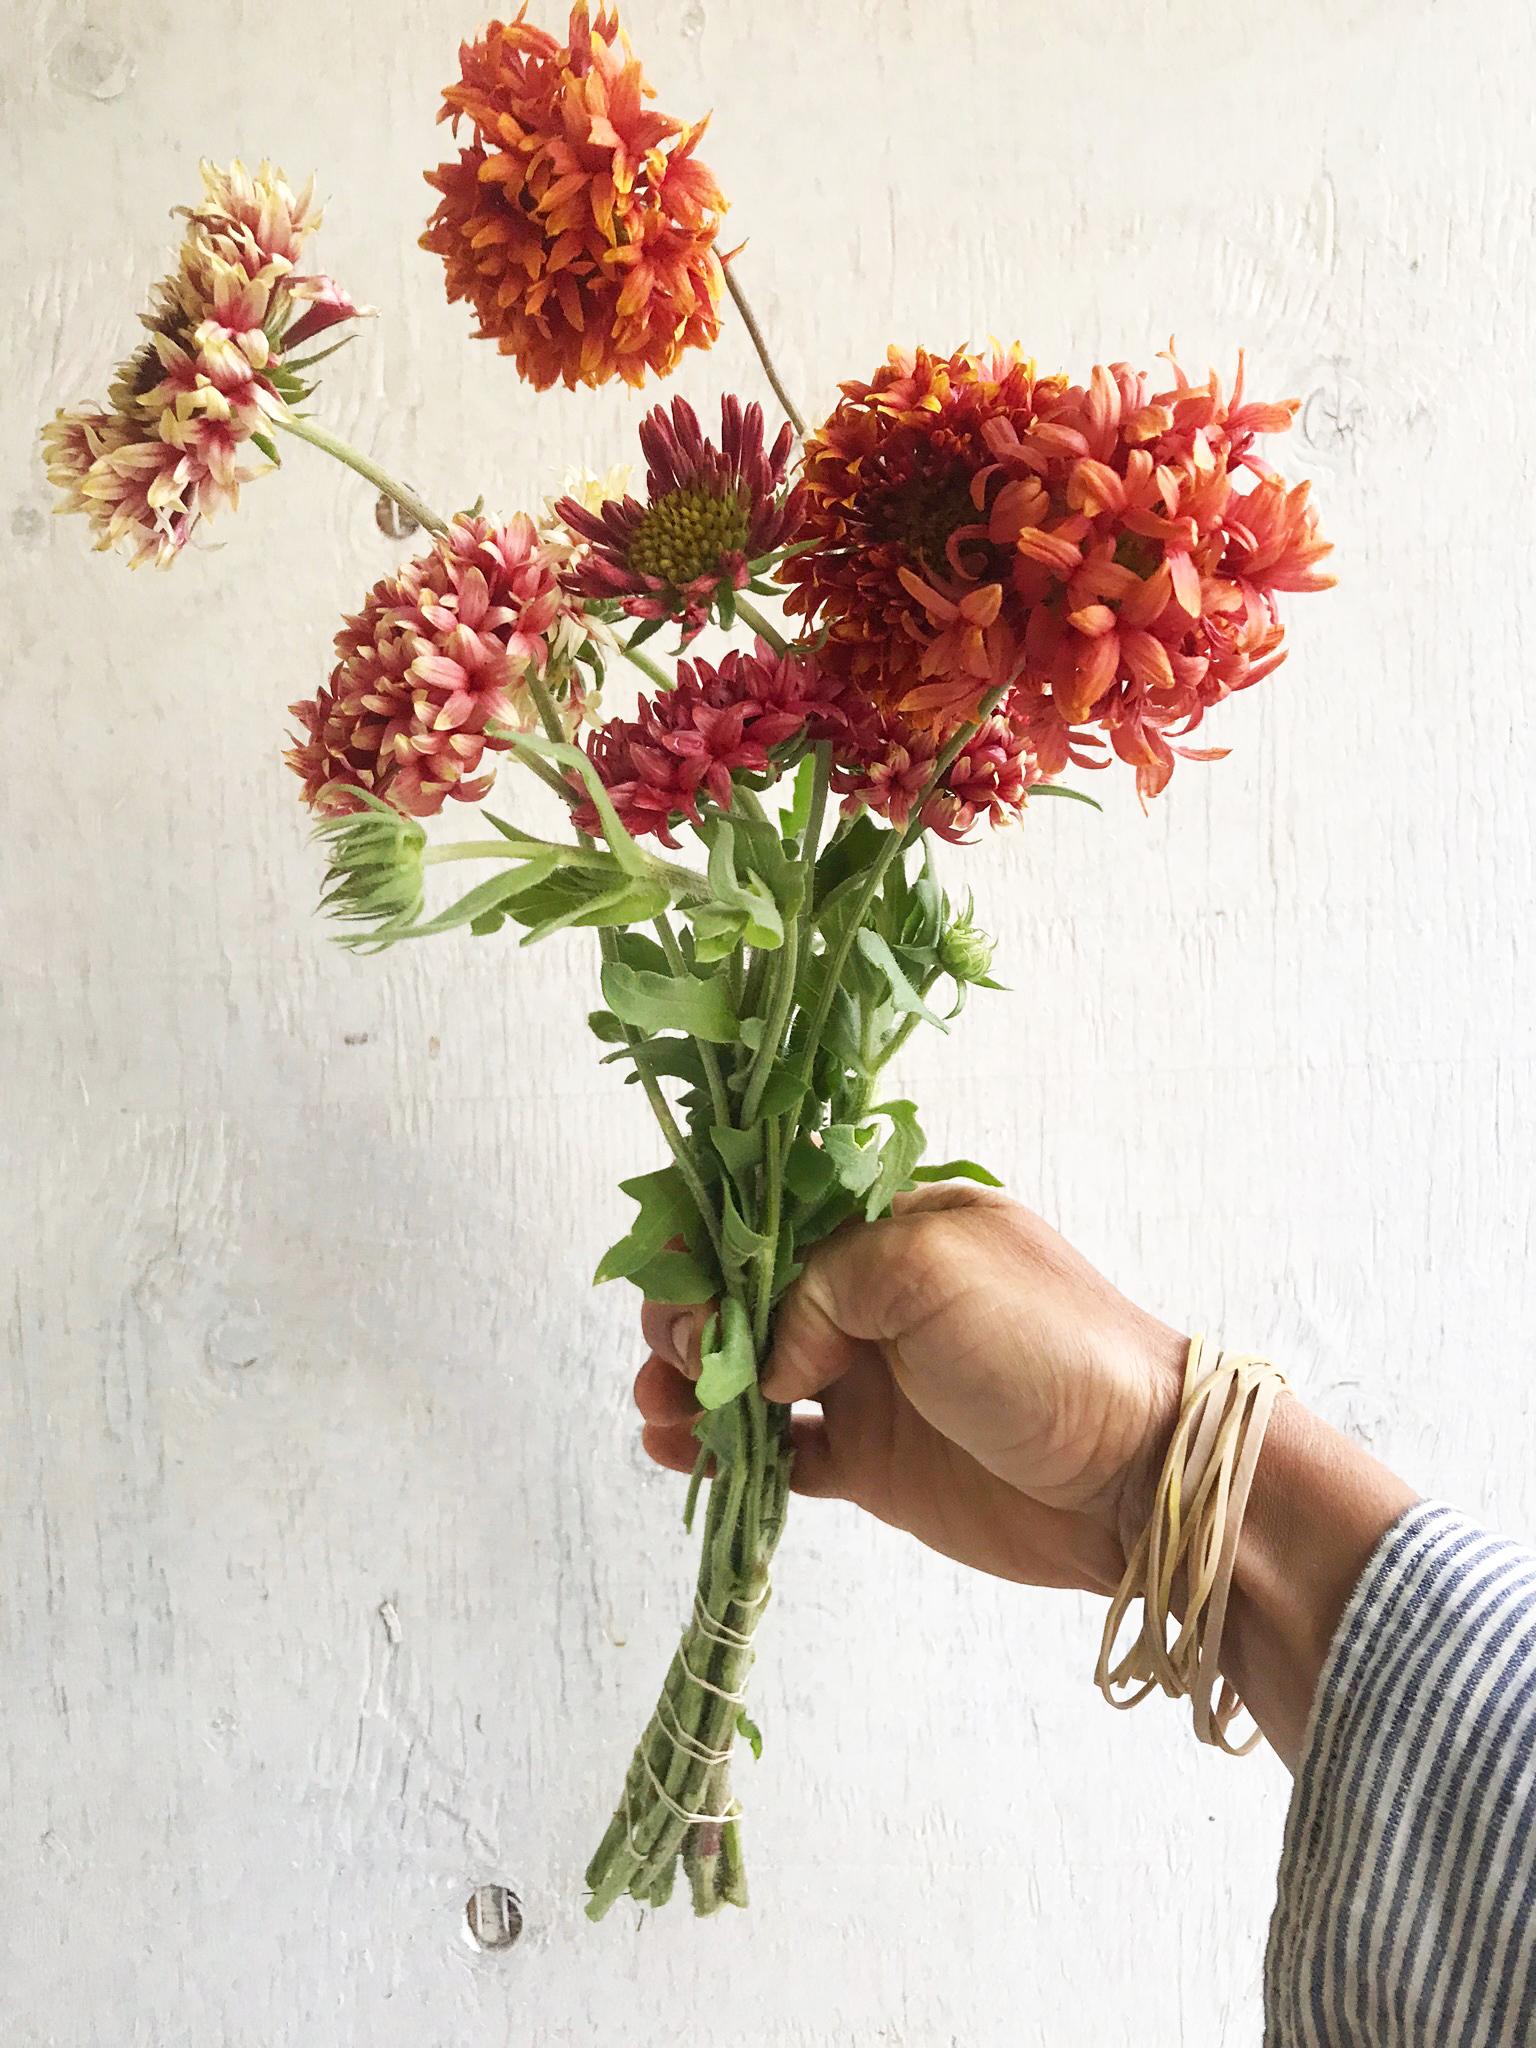 Blanket Flower - Lorenziana